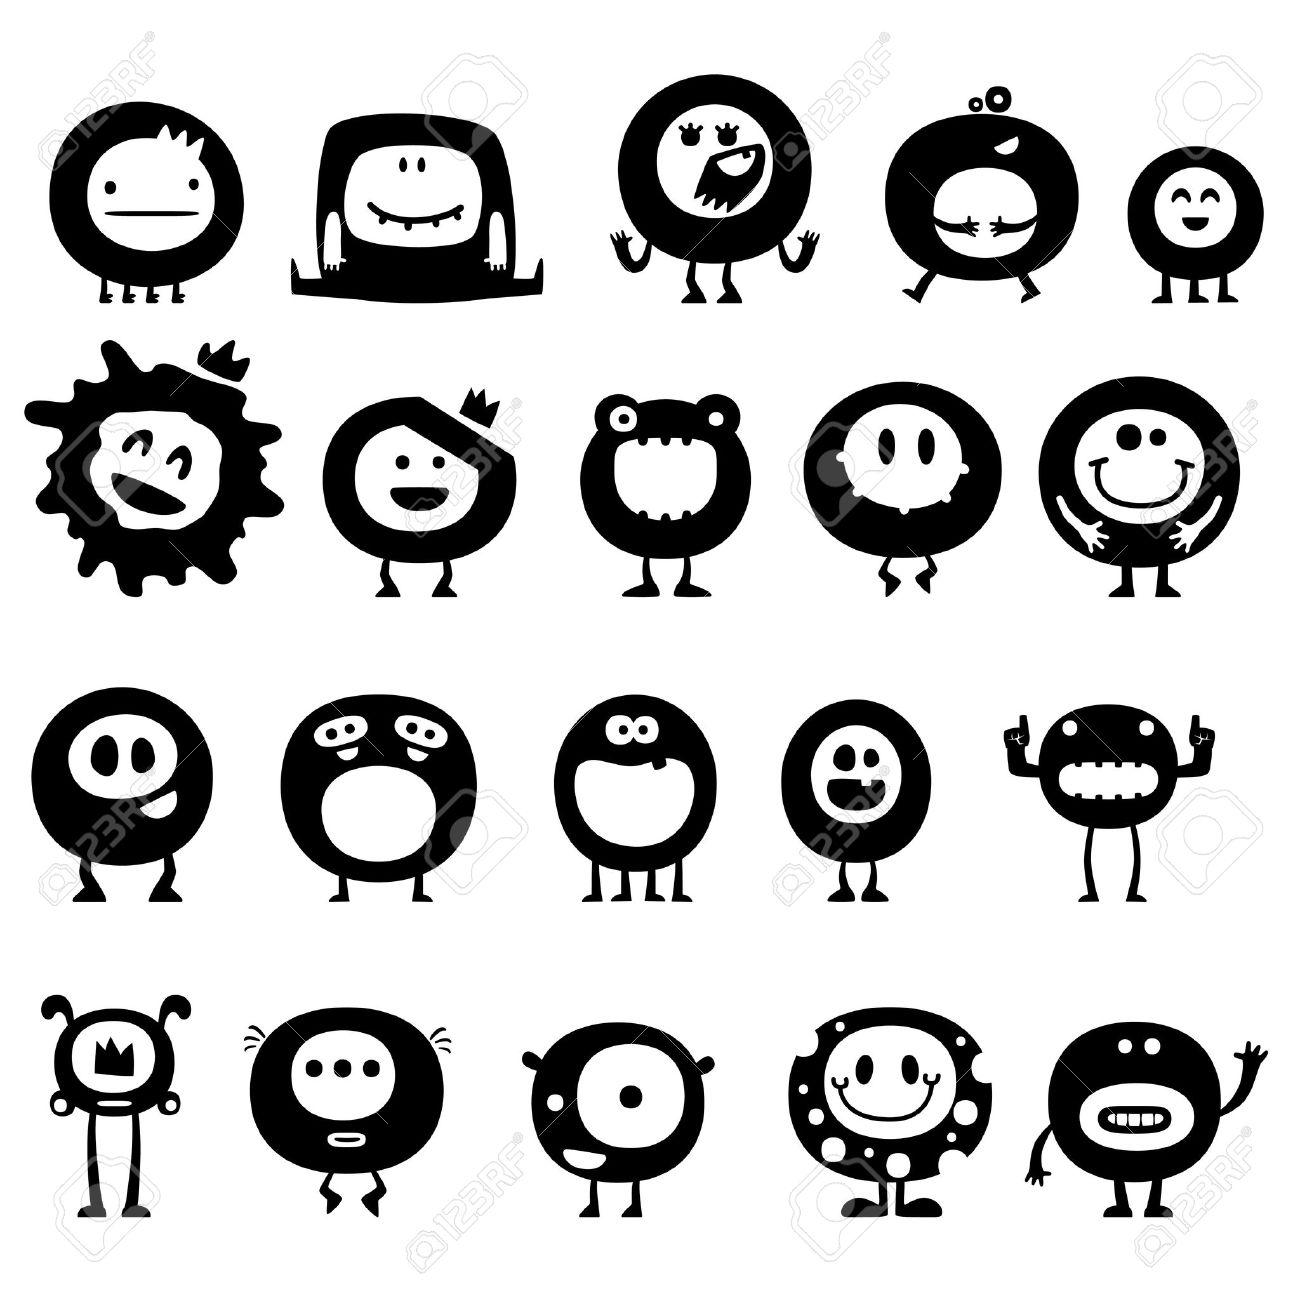 Cute Doodle Monsters Cute Doodle Monsters Doodle